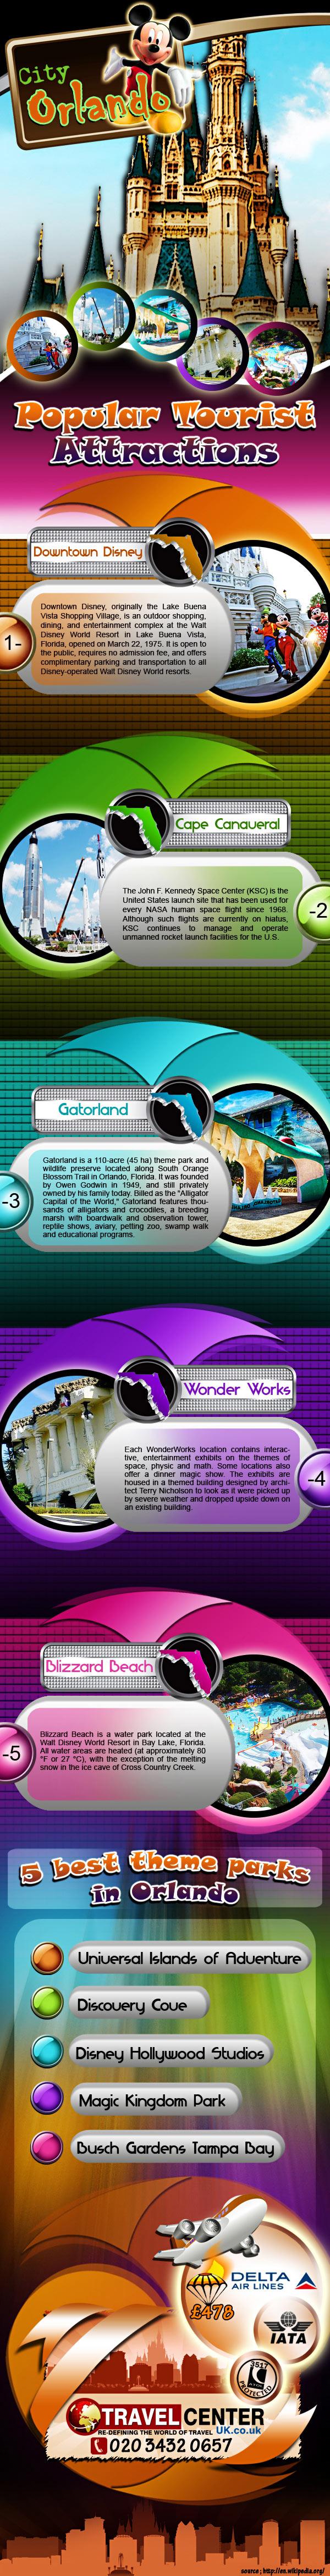 Few stunning sightseeing attractions in Orlando